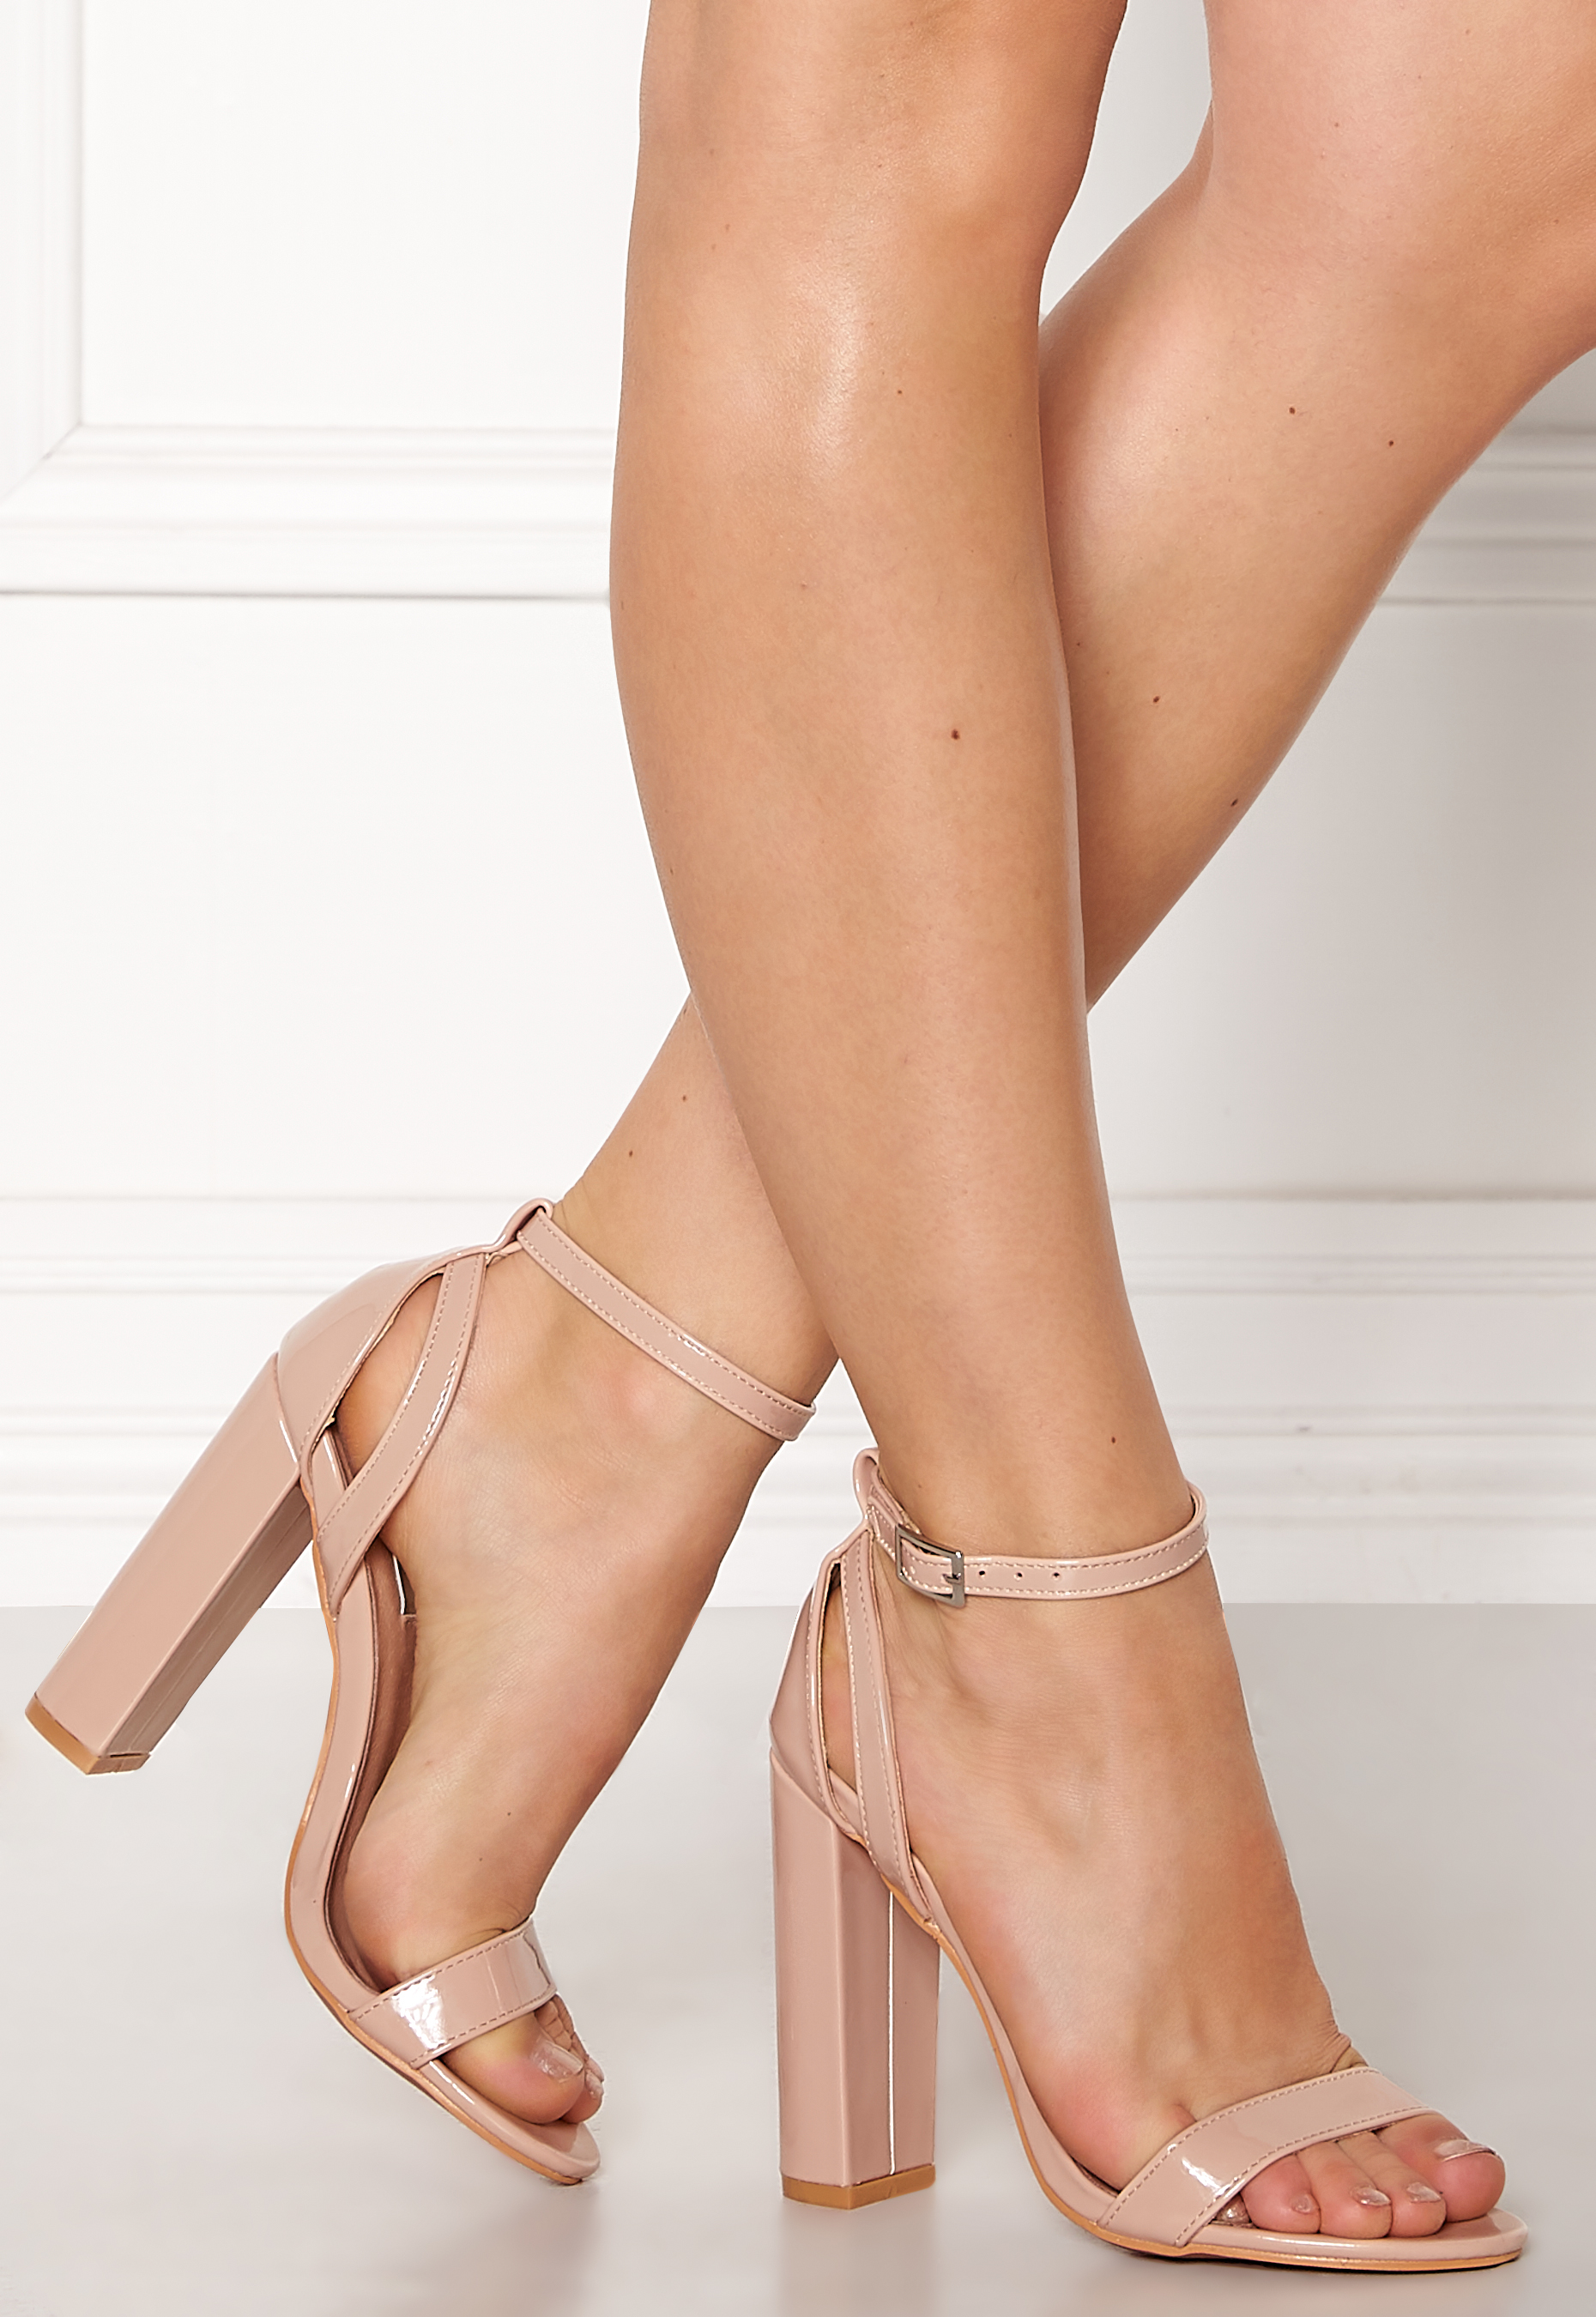 Ariellie nude high heel sandal heels online fashion store